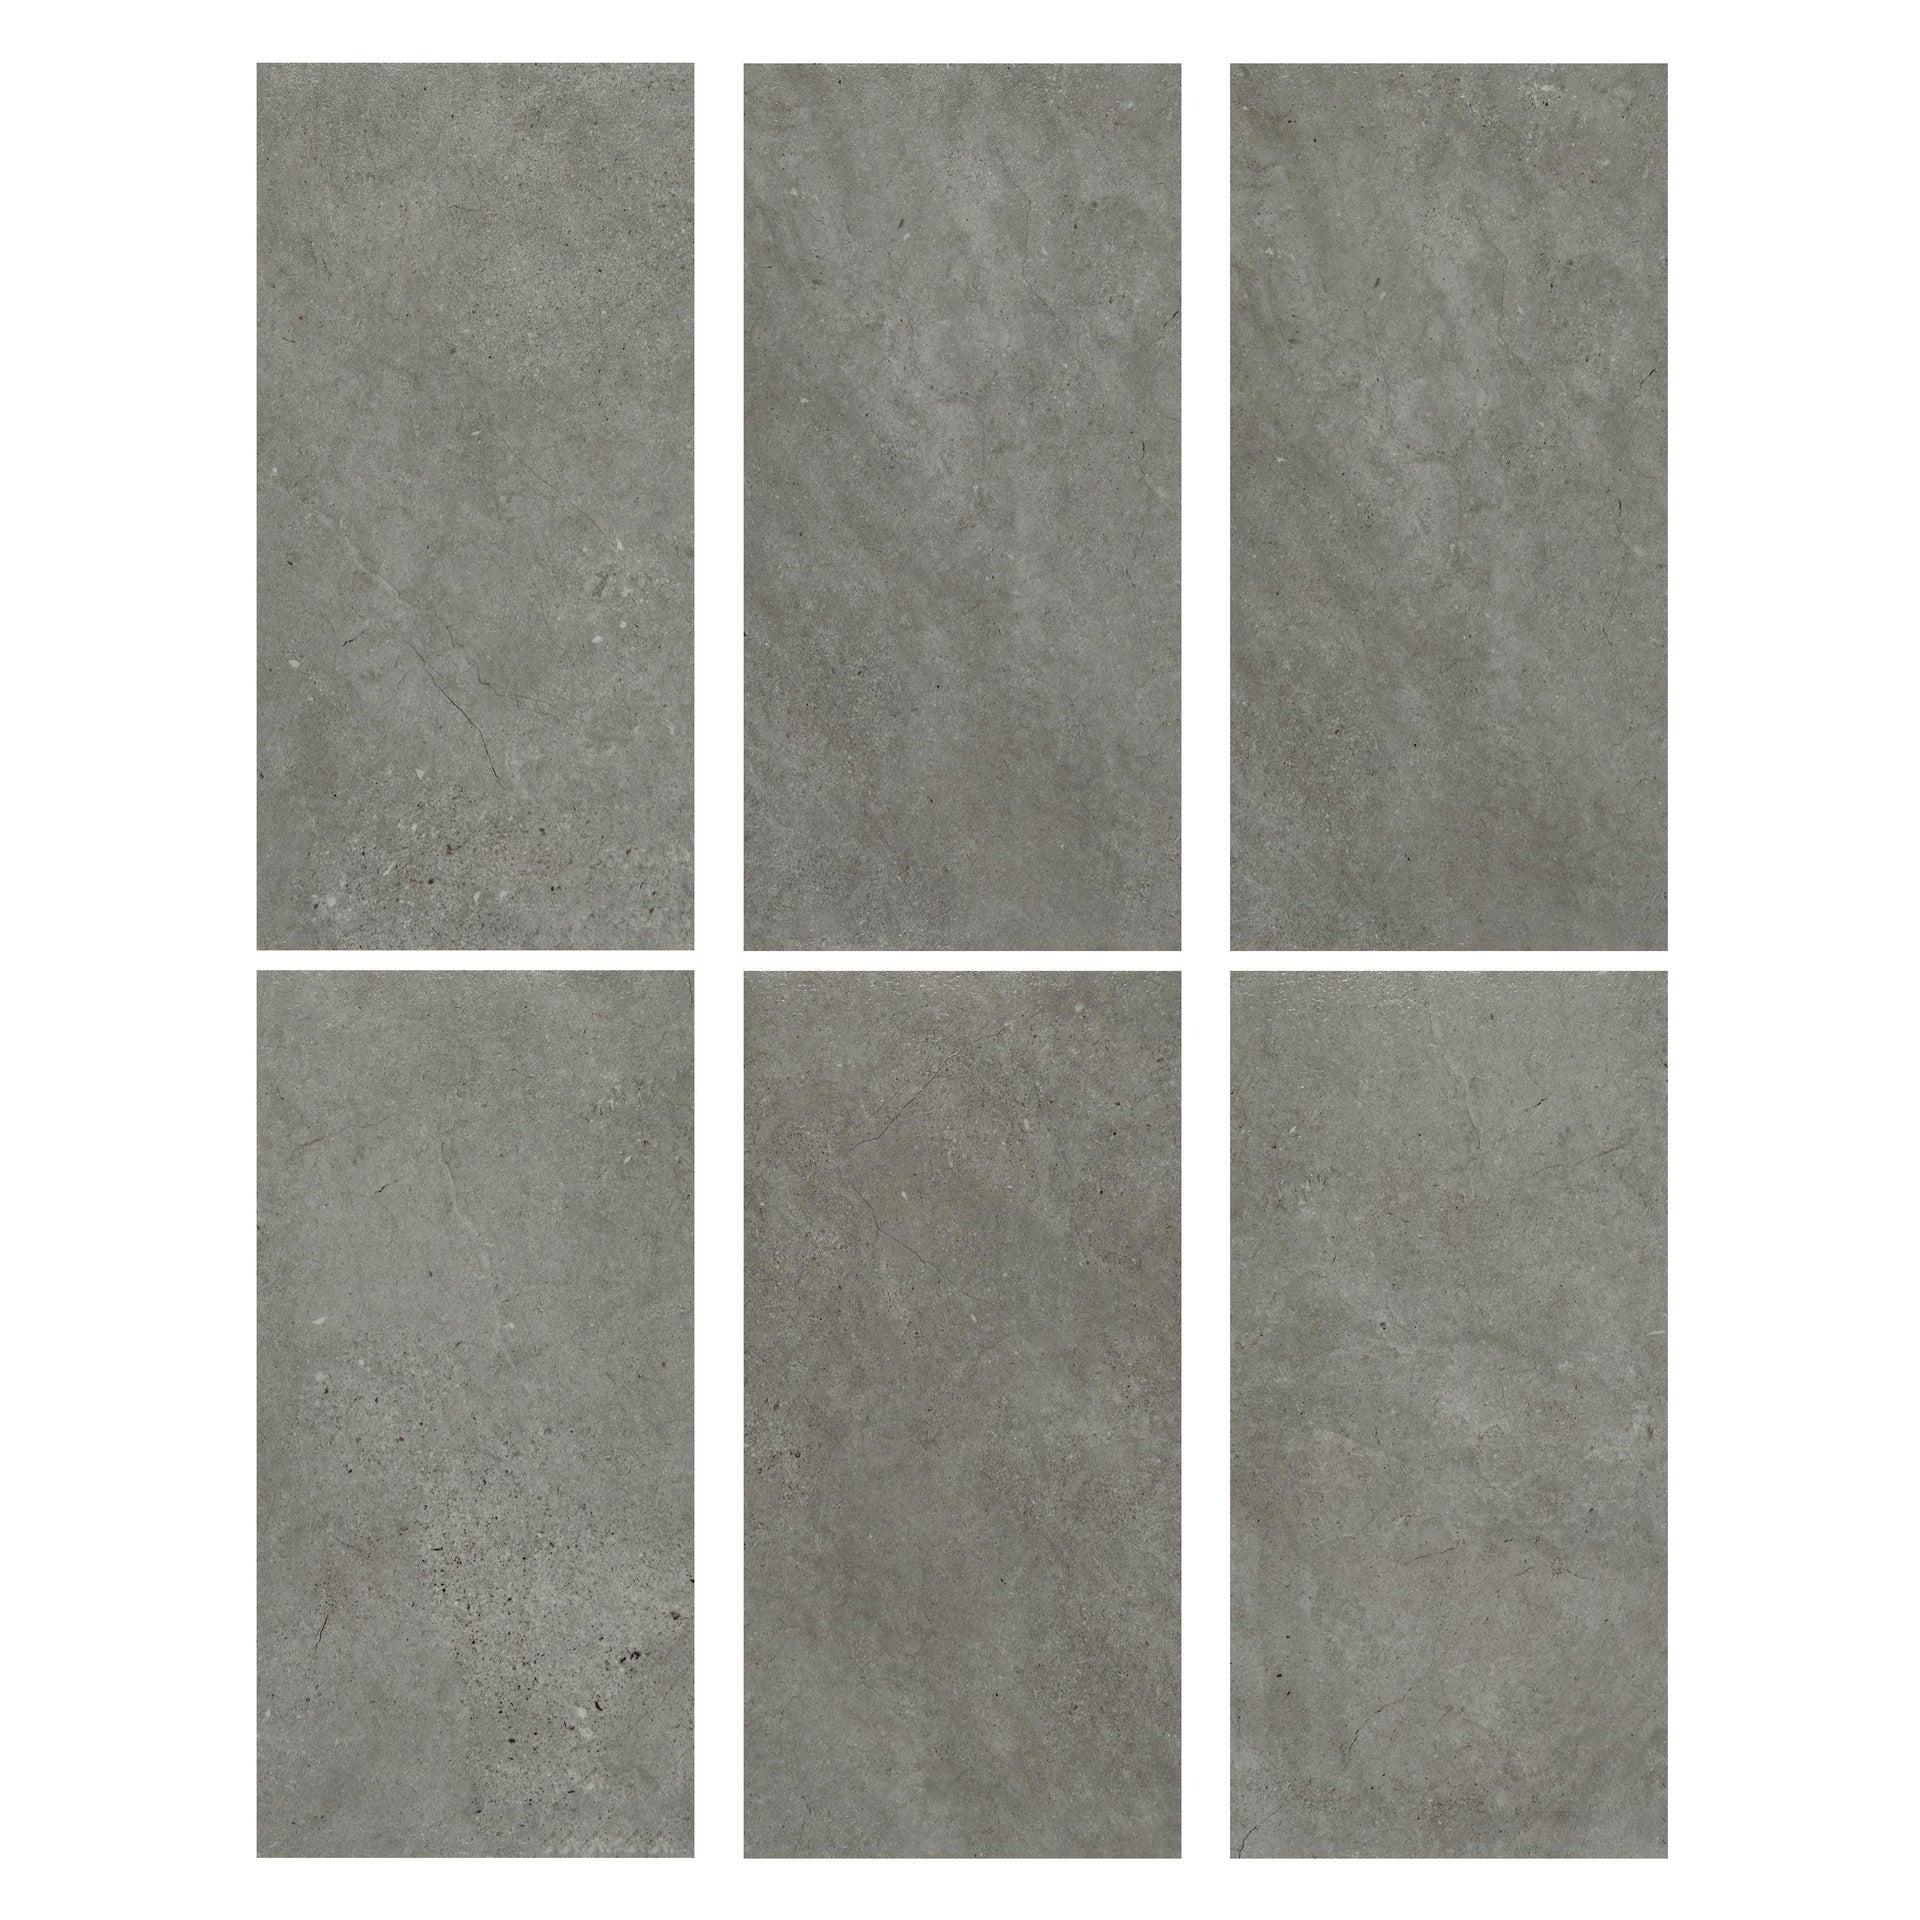 Pavimento PVC adesivo Kangean Sp 2 mm beige - 4